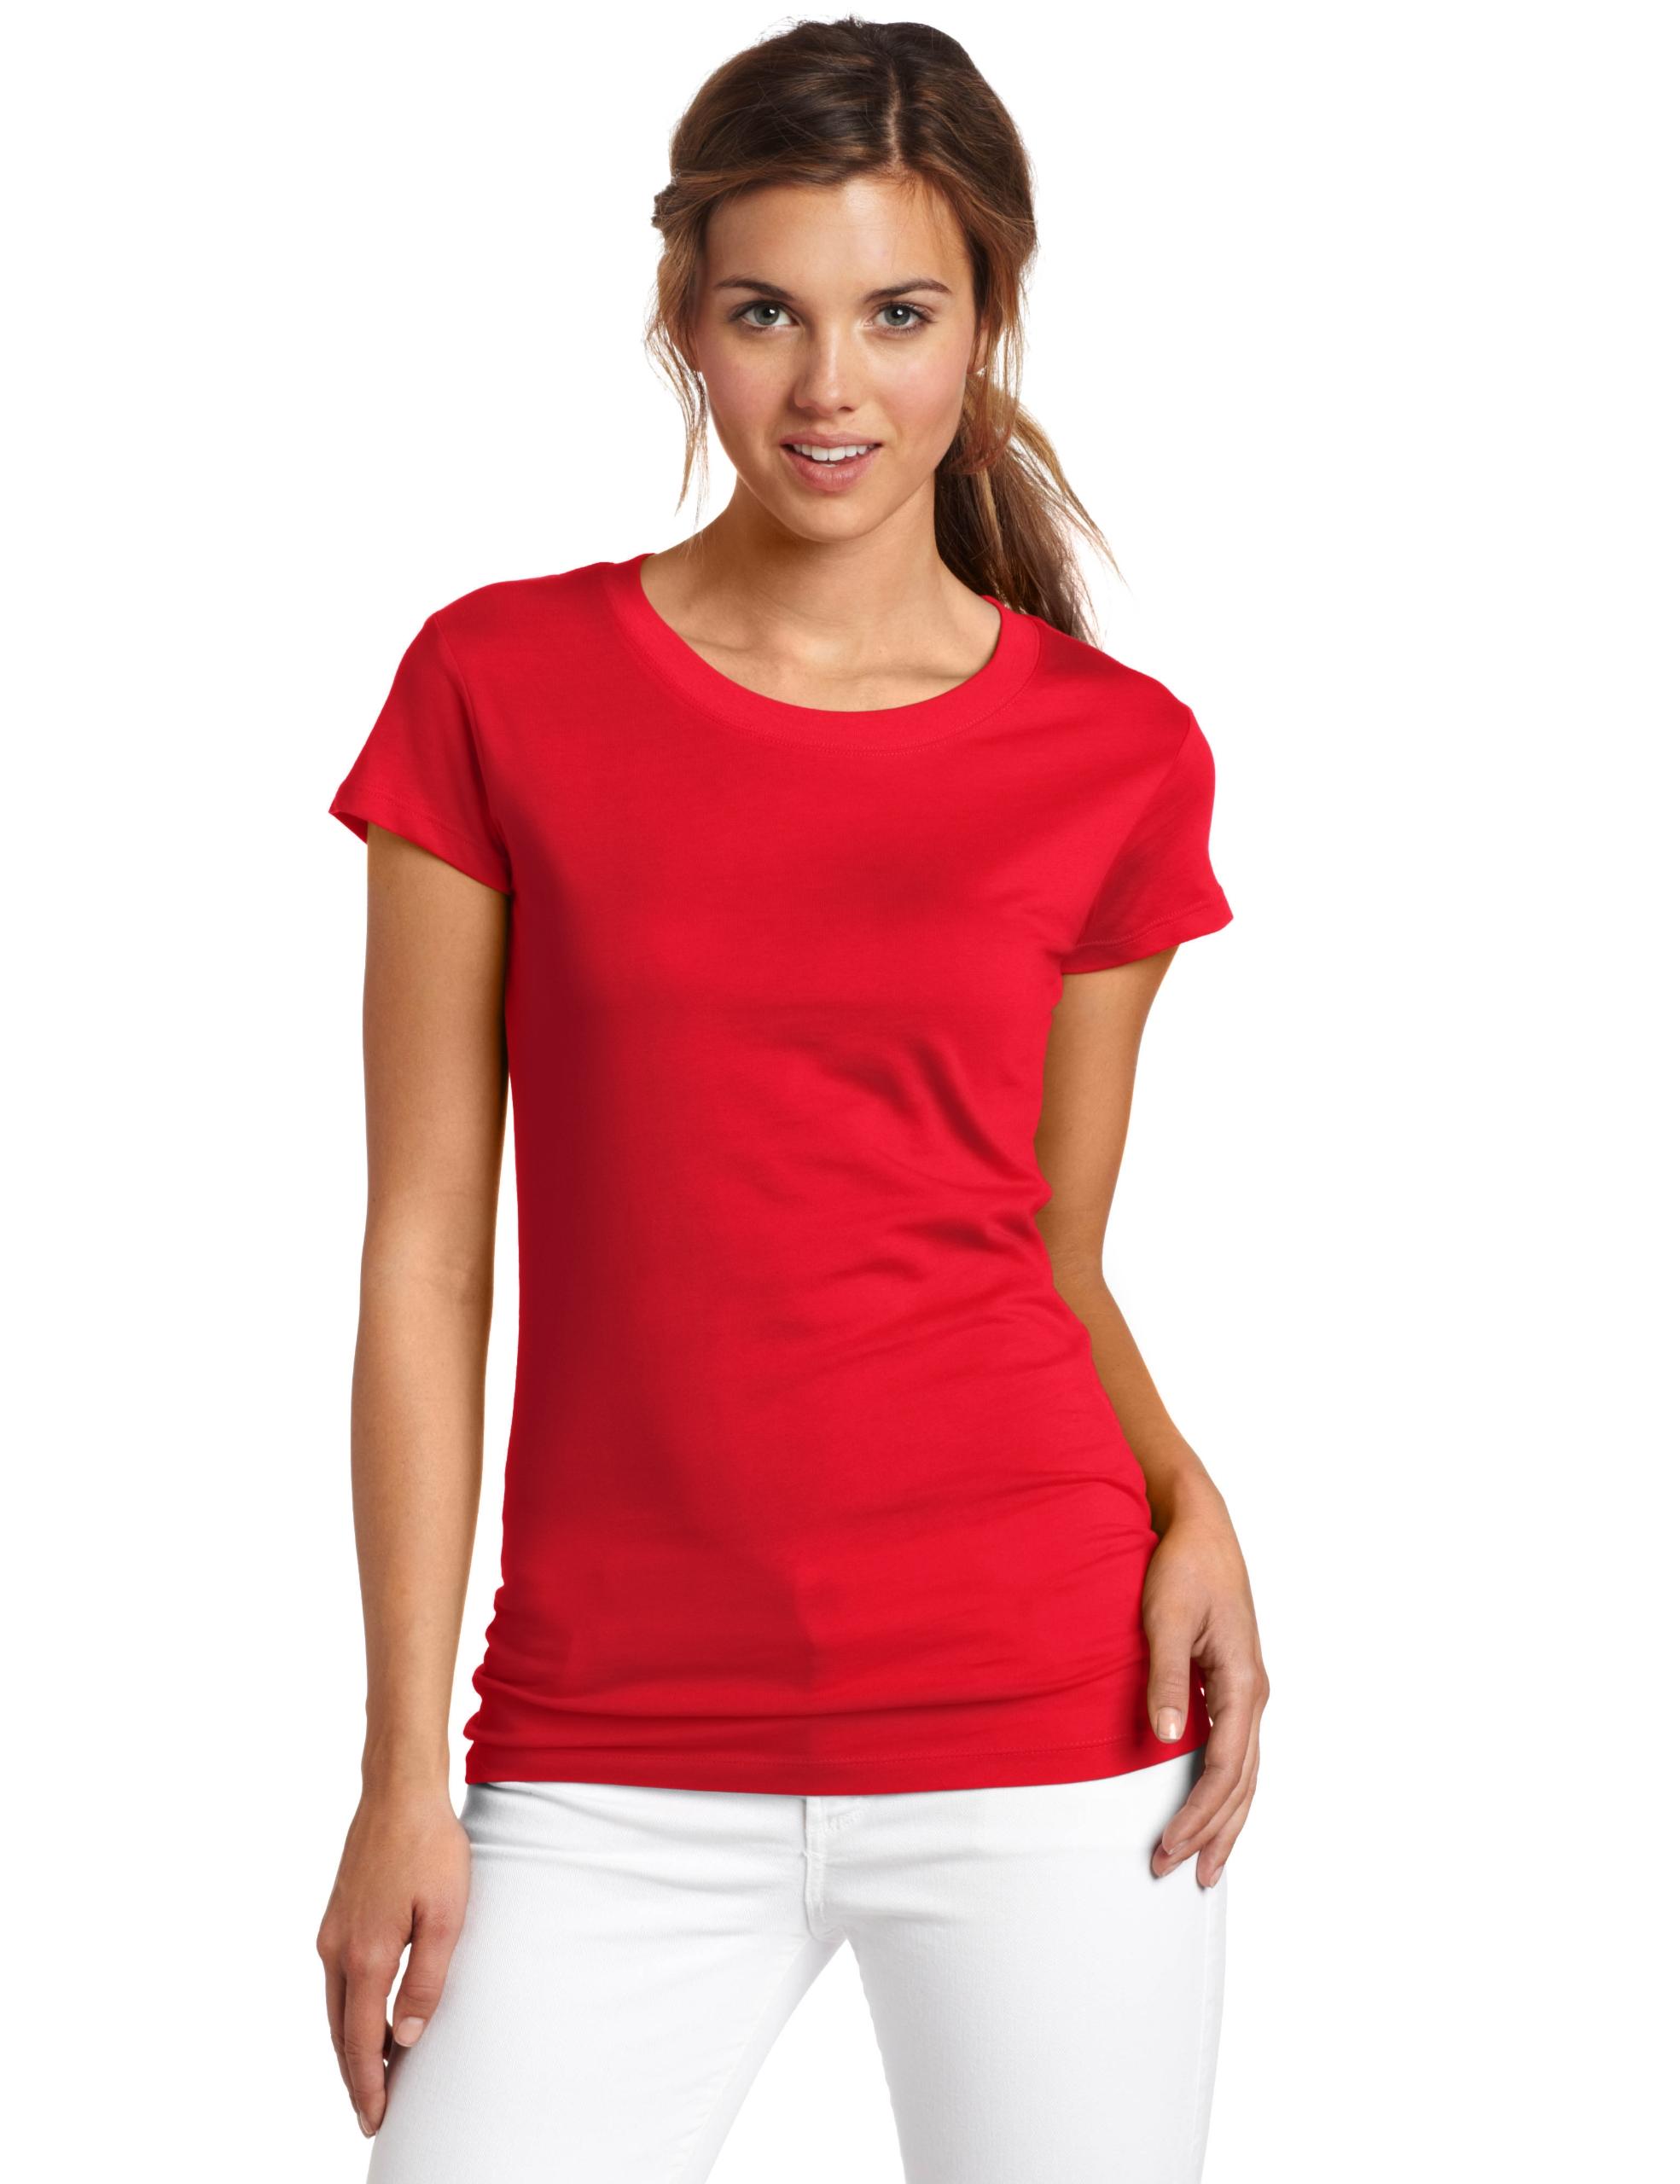 Dickies Girl Juniors Short Sleeve Crew Neck Tee,Red,Large